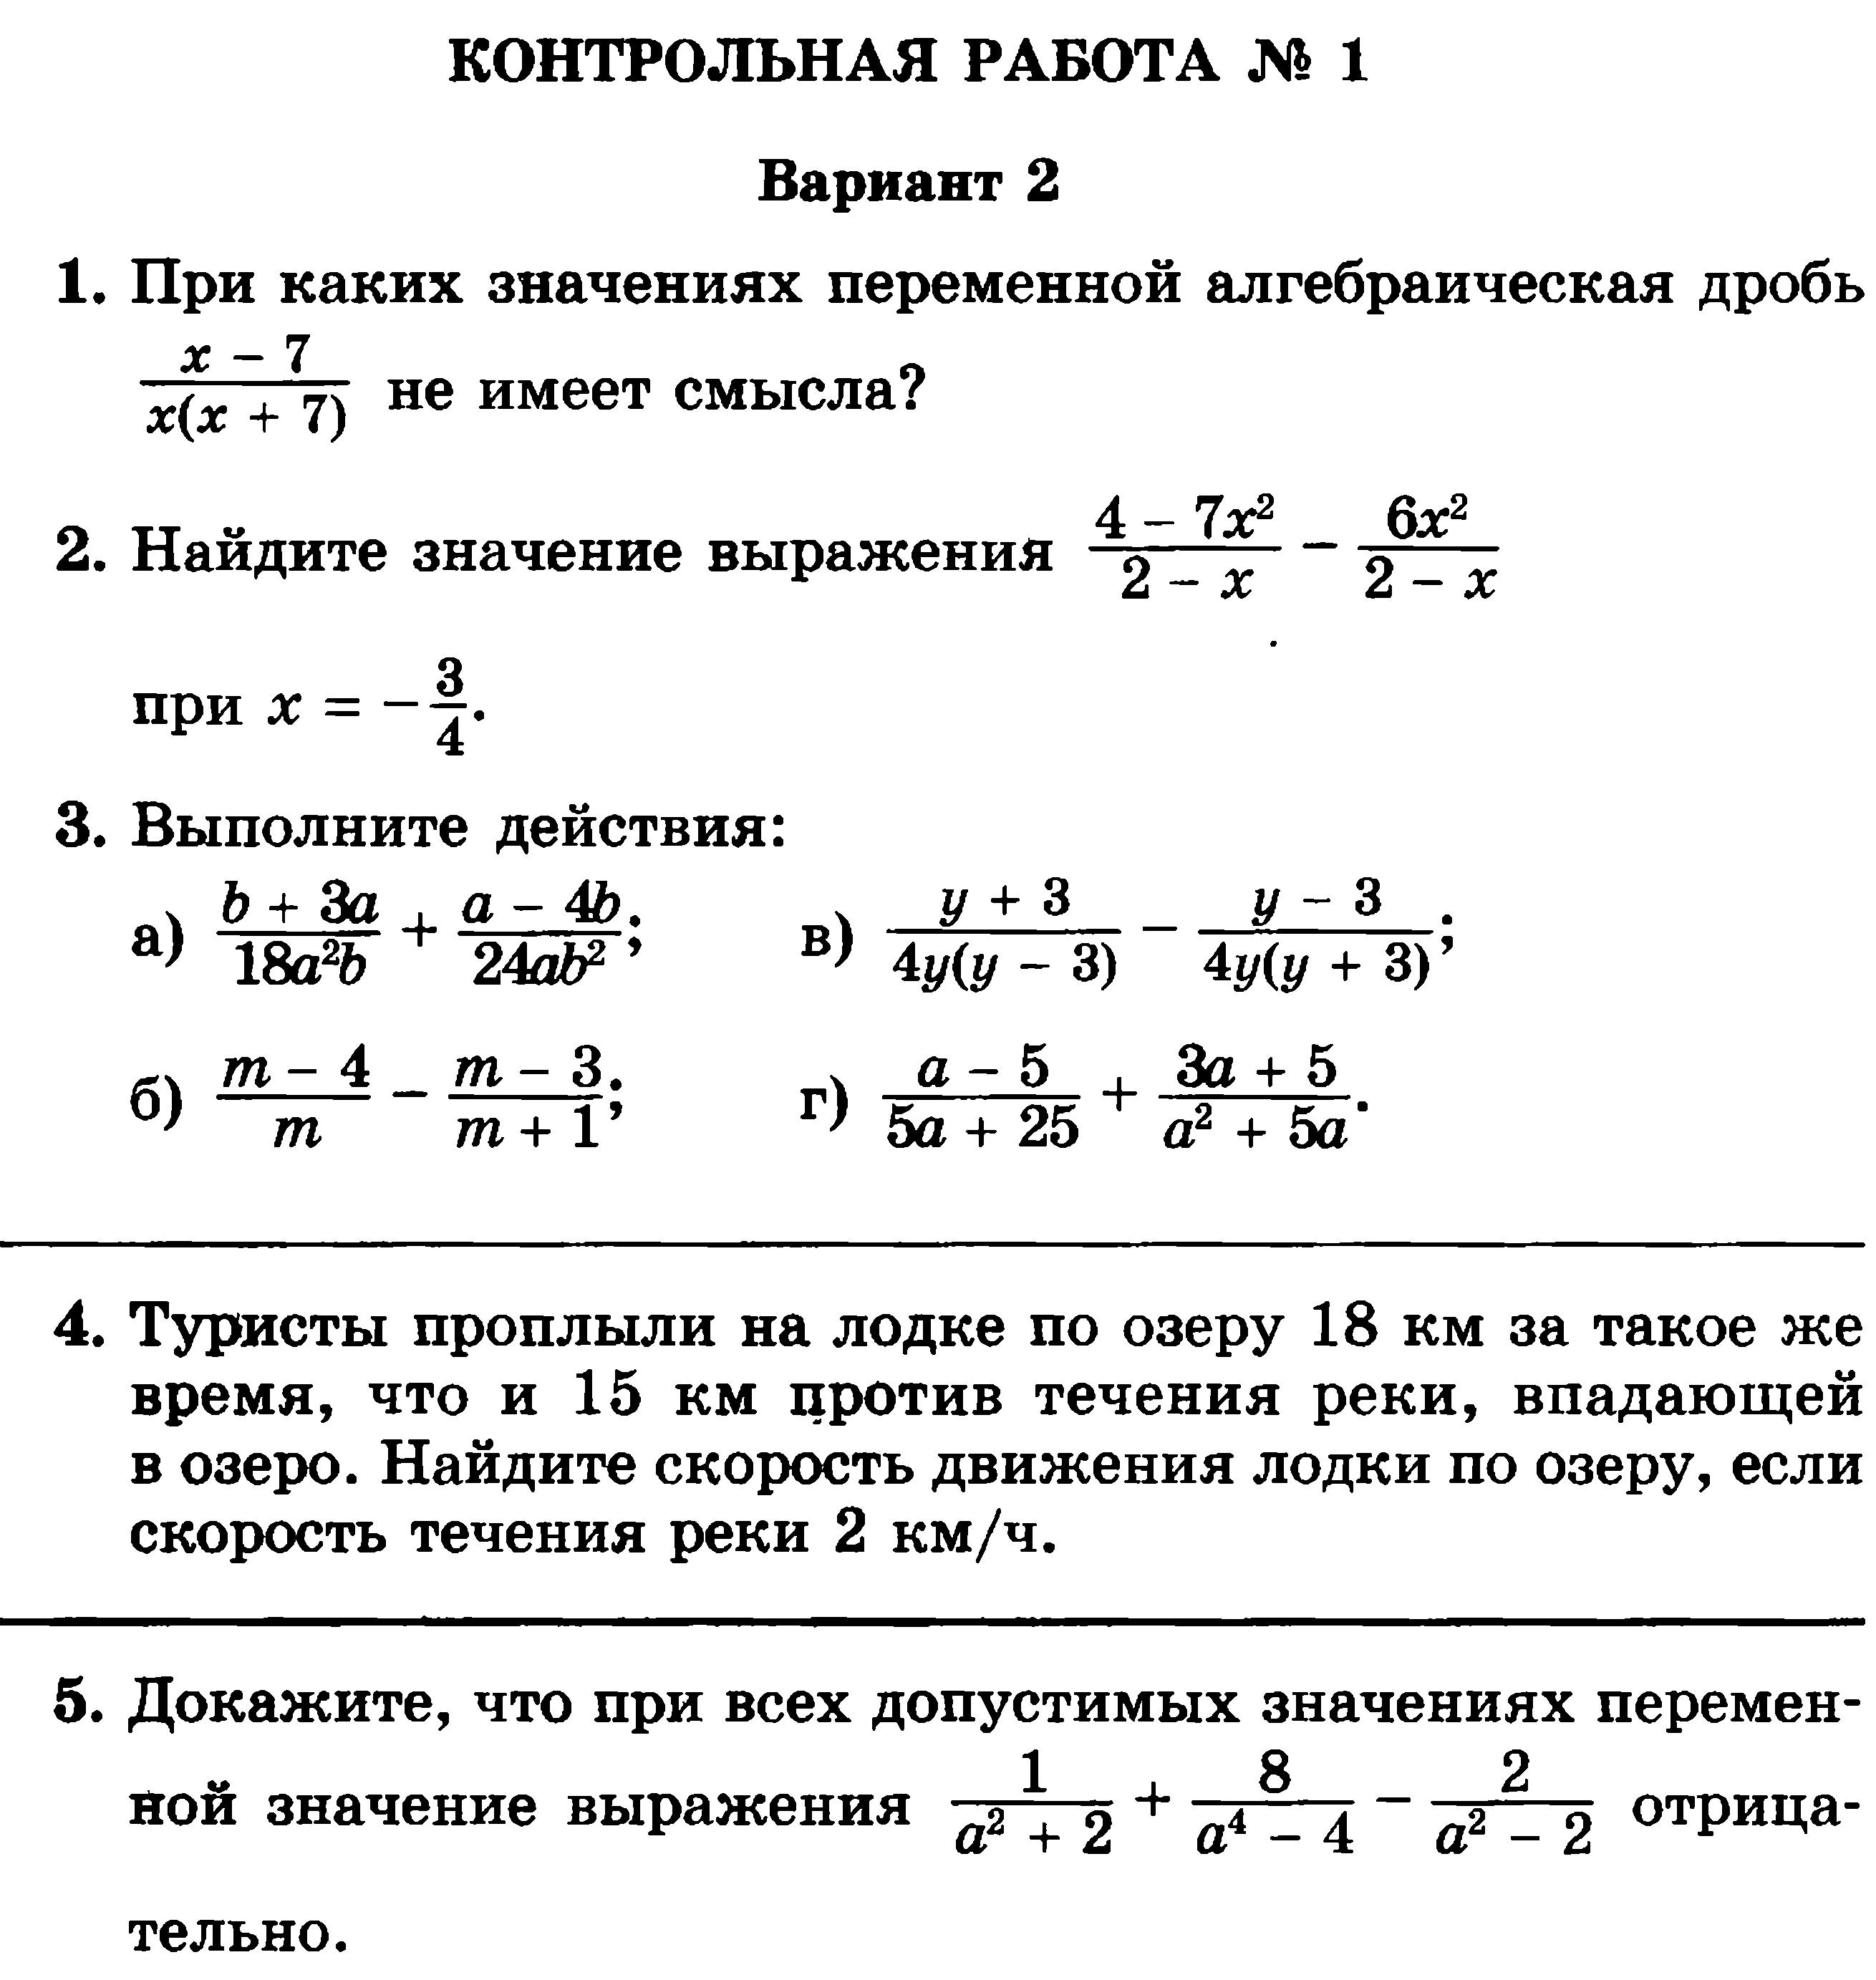 рабочая программа по математике для классов к УМК Бунимович  hello html 3402e401 png hello html 10944ab7 png